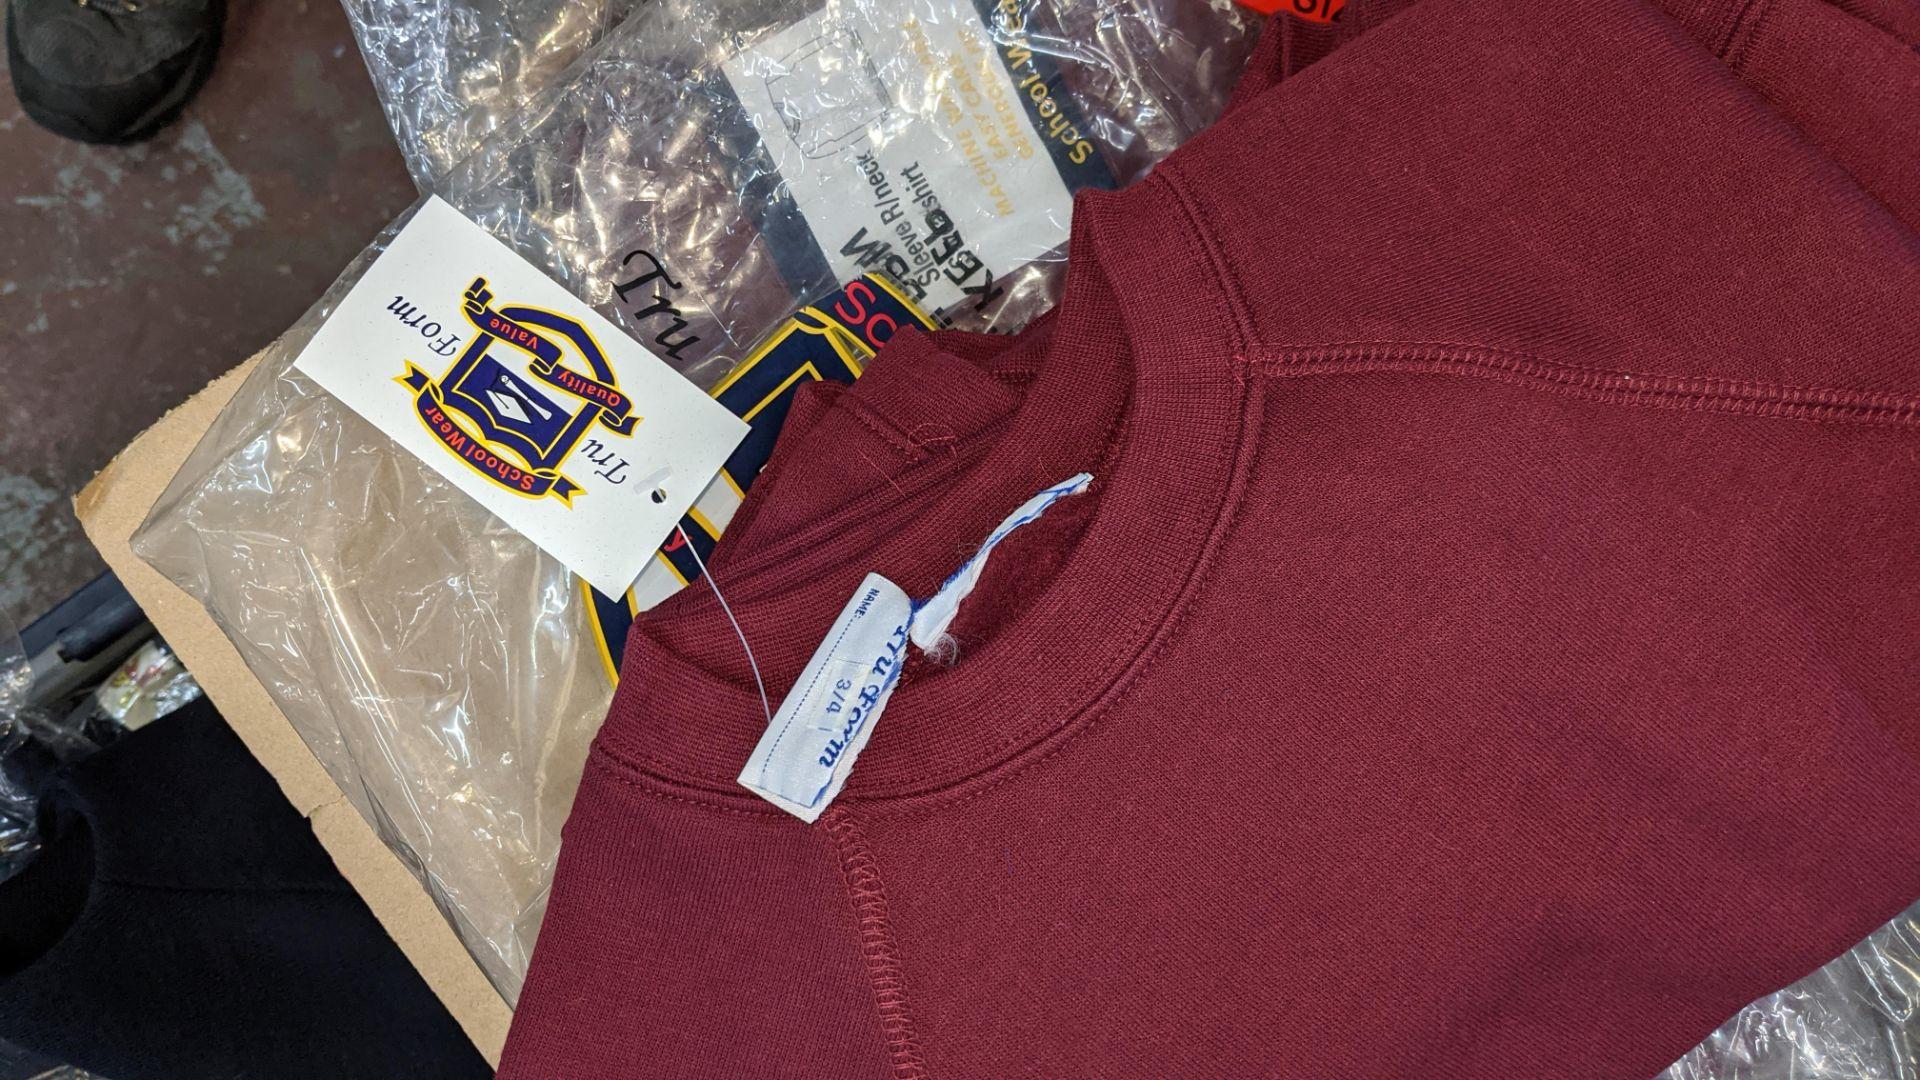 Approx 36 off children's burgundy sweatshirts - 1 large box - Image 3 of 4